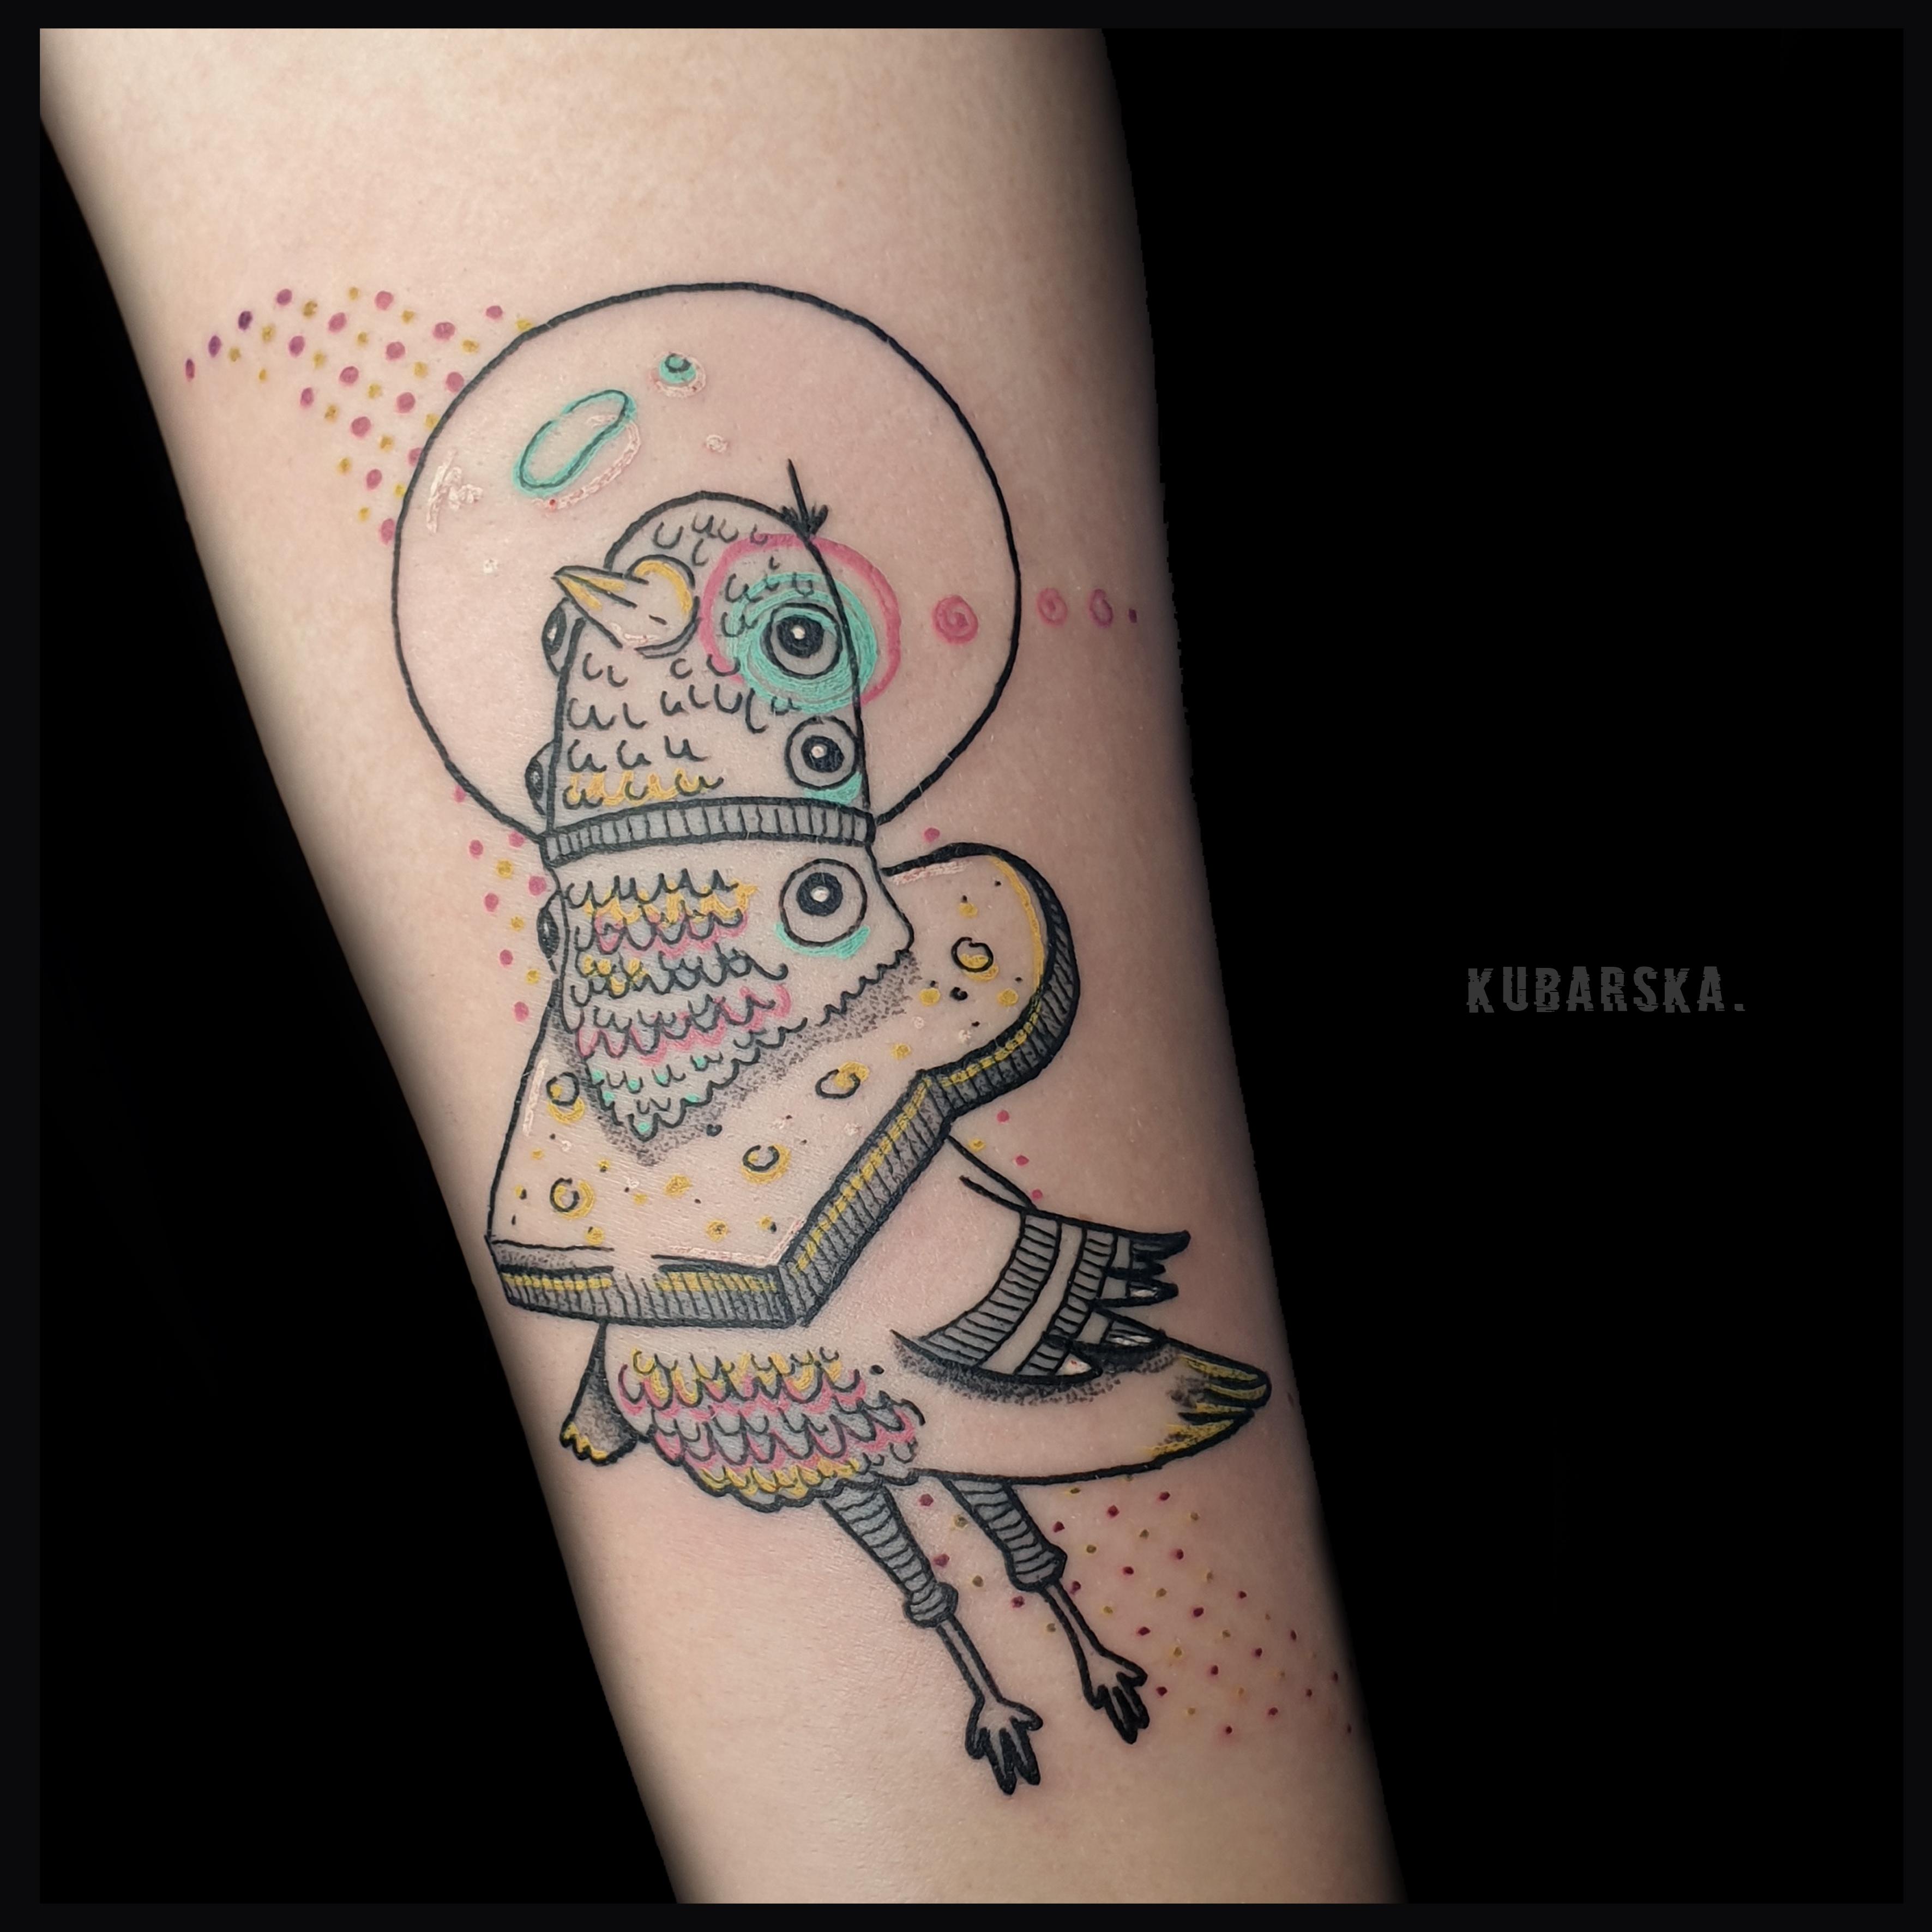 Inksearch tattoo Iwona Kubarska